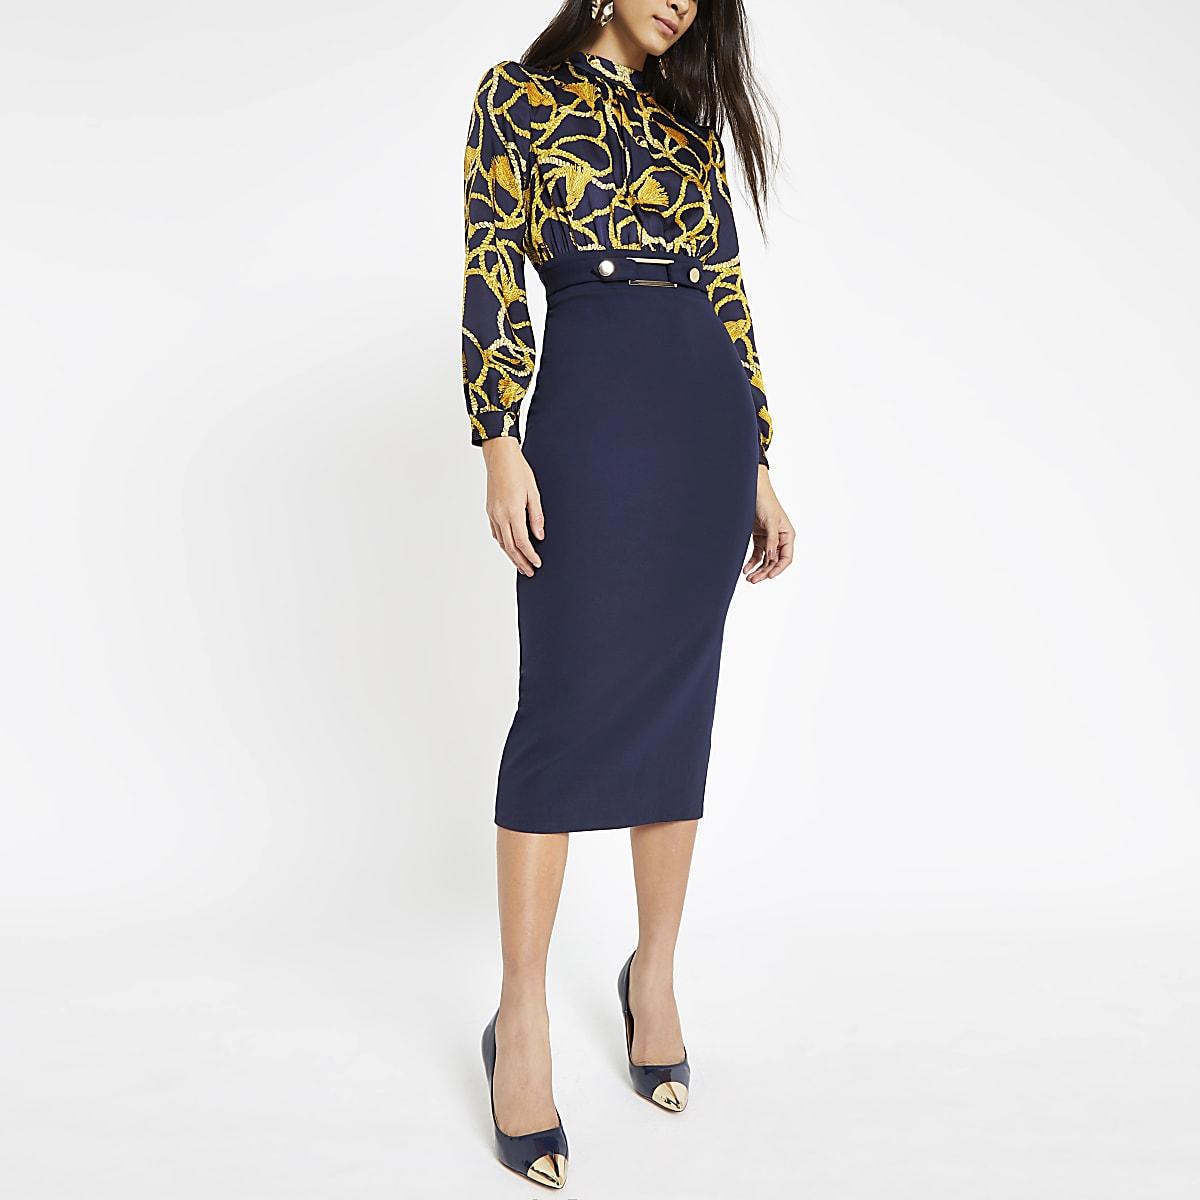 Navy chain print high neck dress